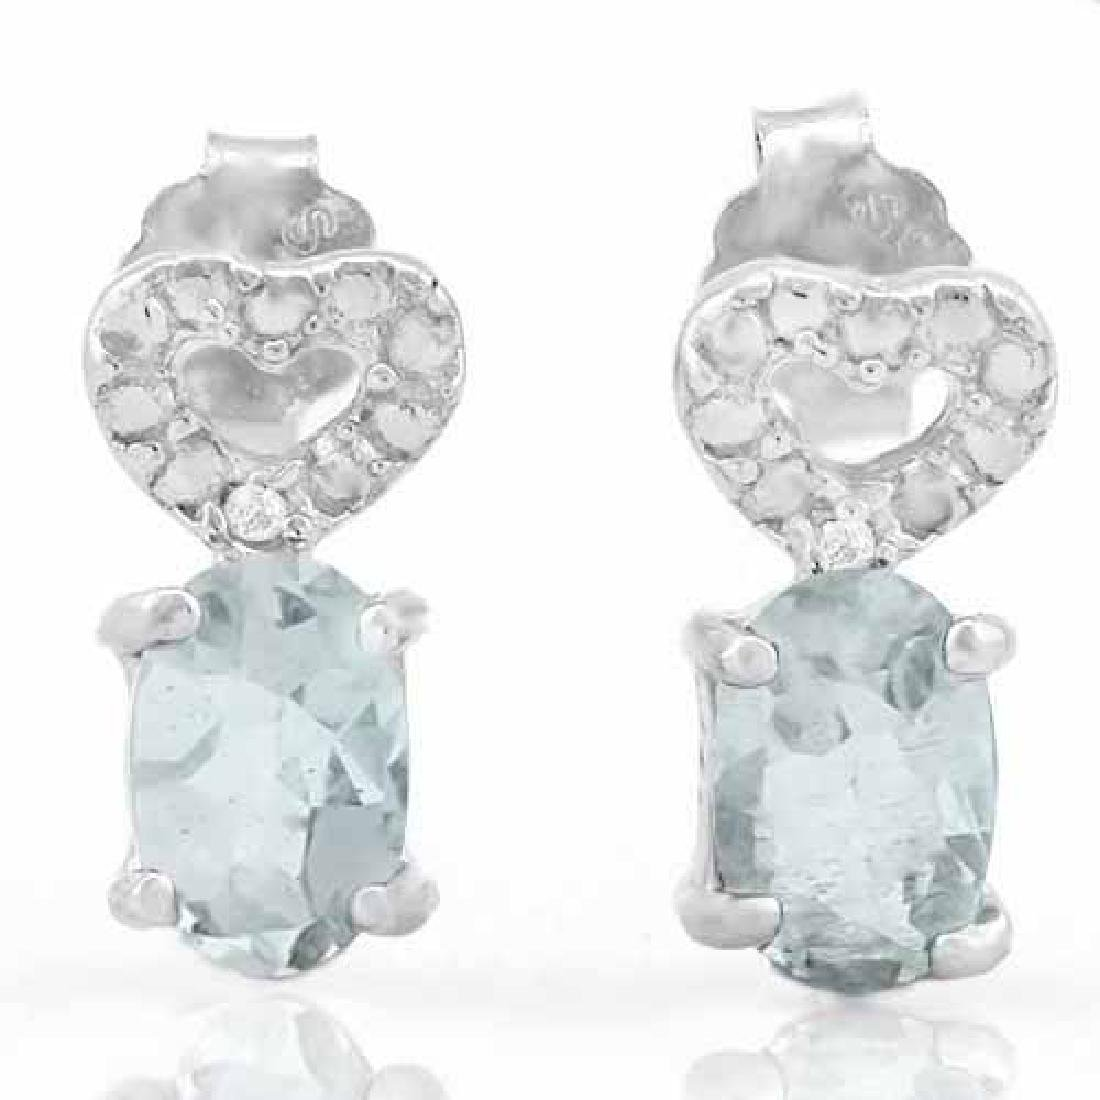 3/4 CARAT AQUAMARINE & DIAMOND 925 STERLING SILVER EARR